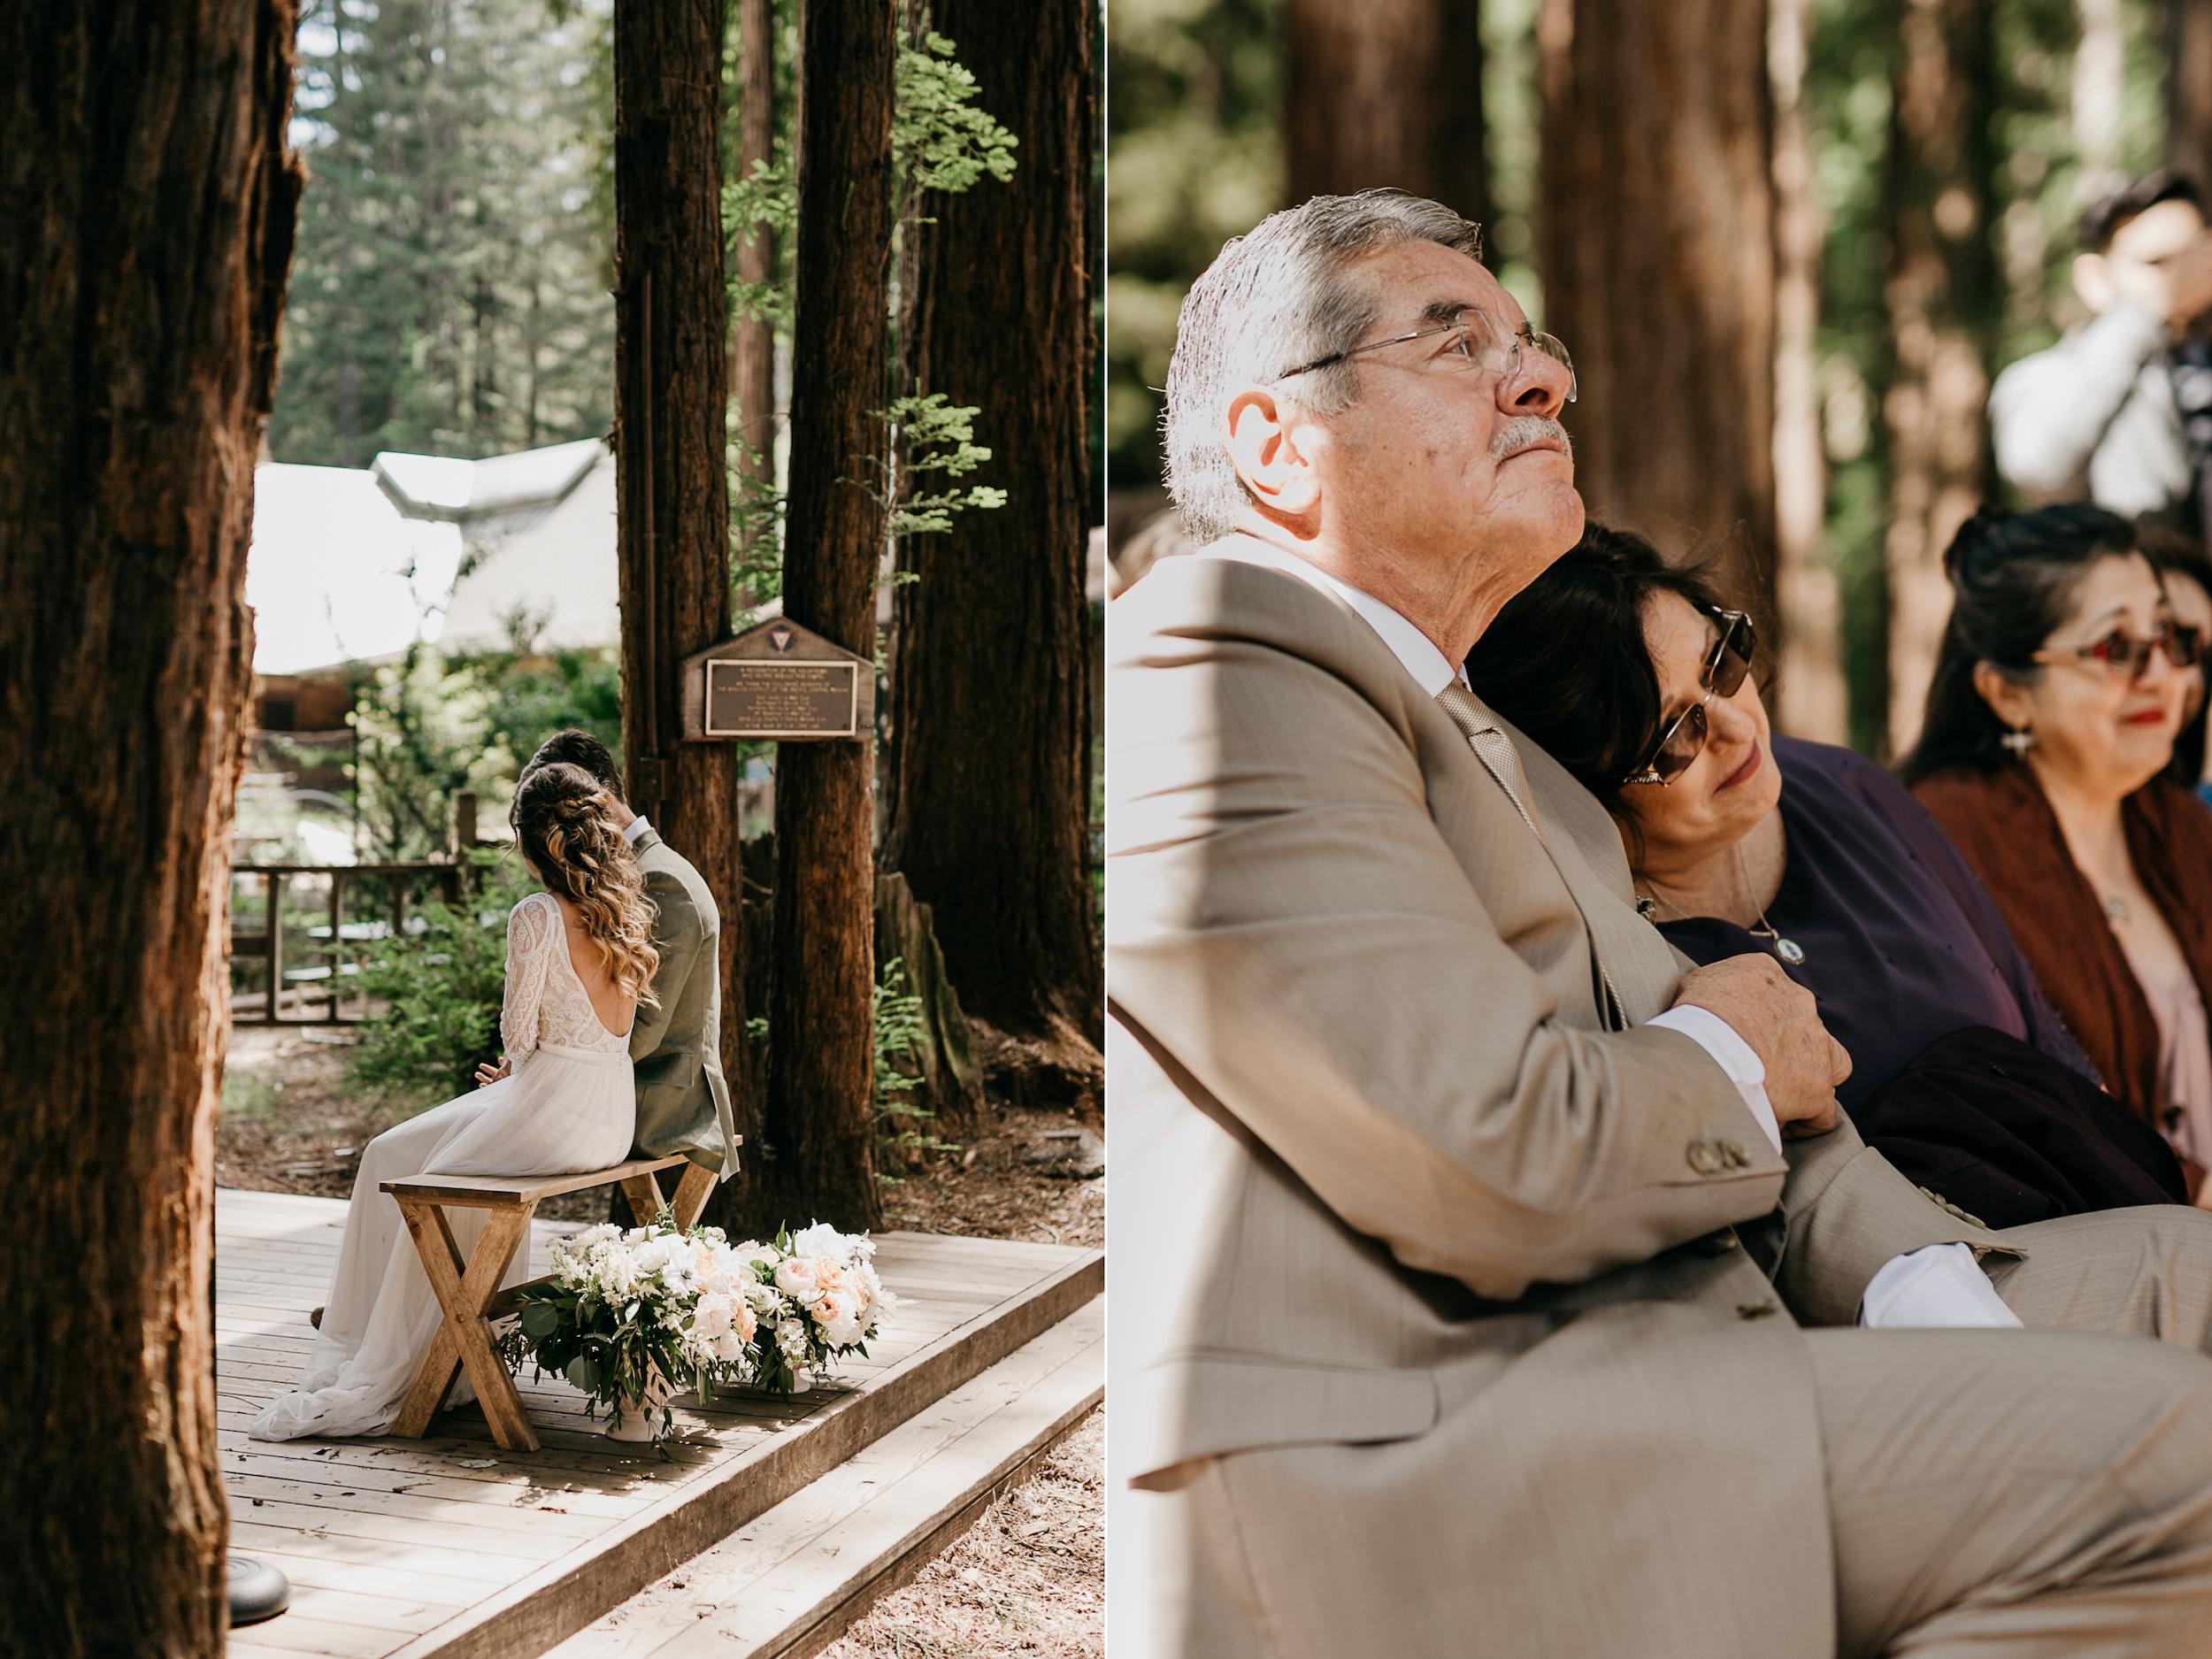 camp campbell-wedding-photographer022.jpg